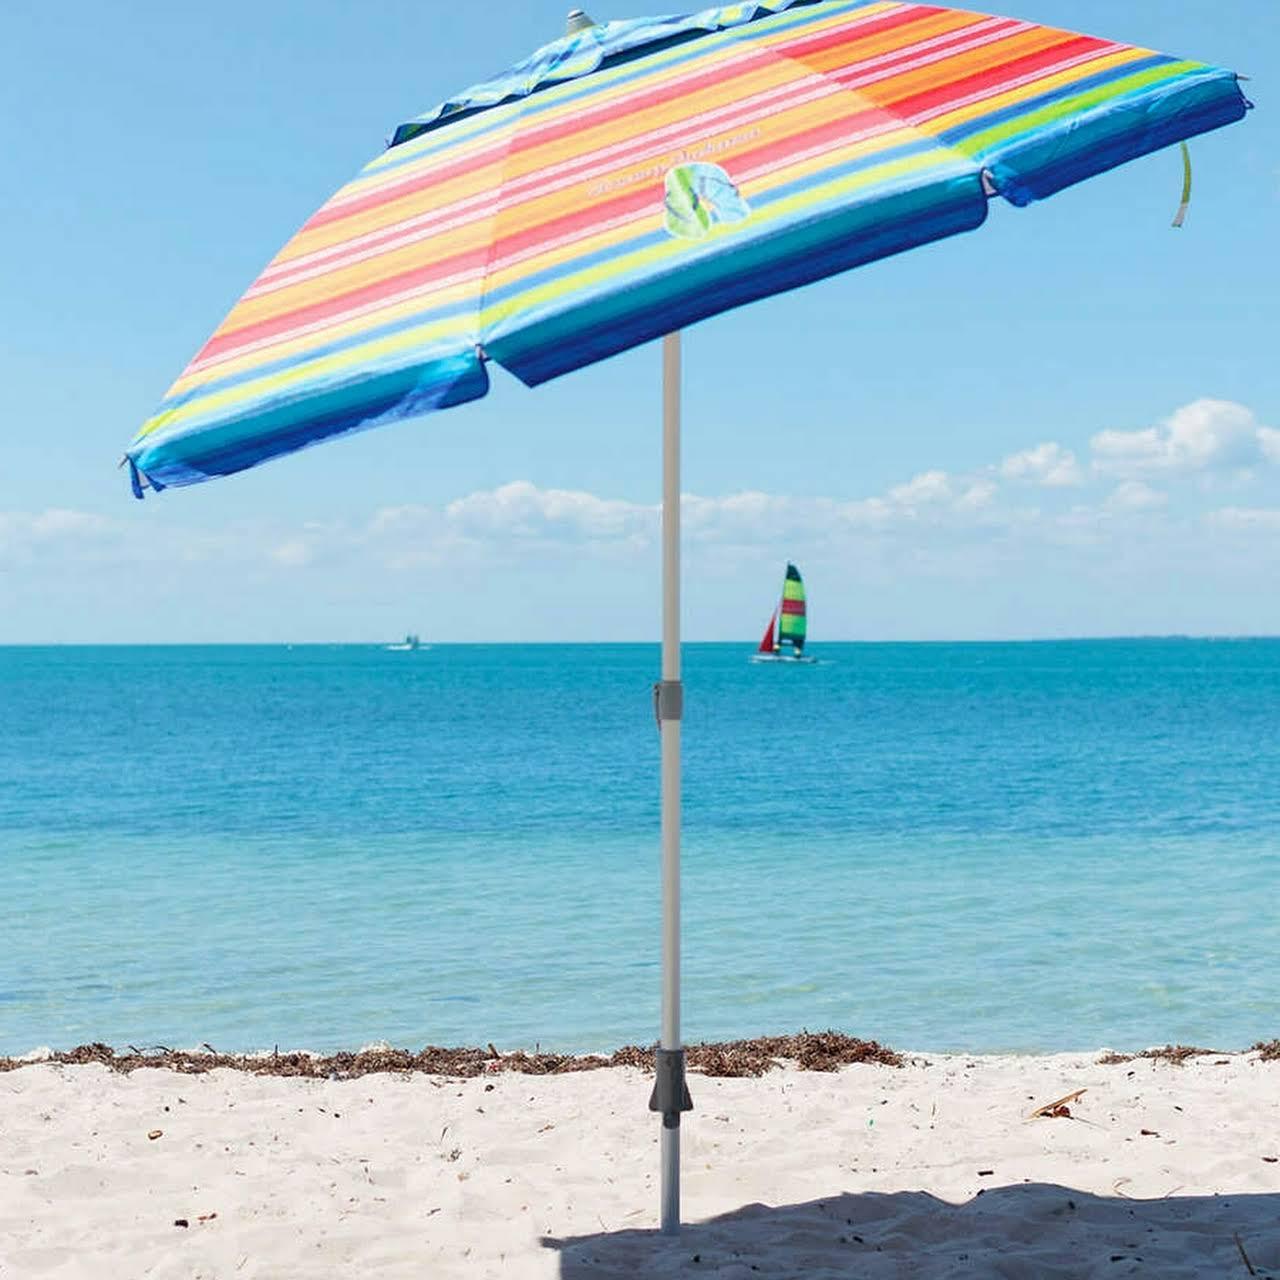 Sun Seats Quality Beach Chair Rentals And Umbrella